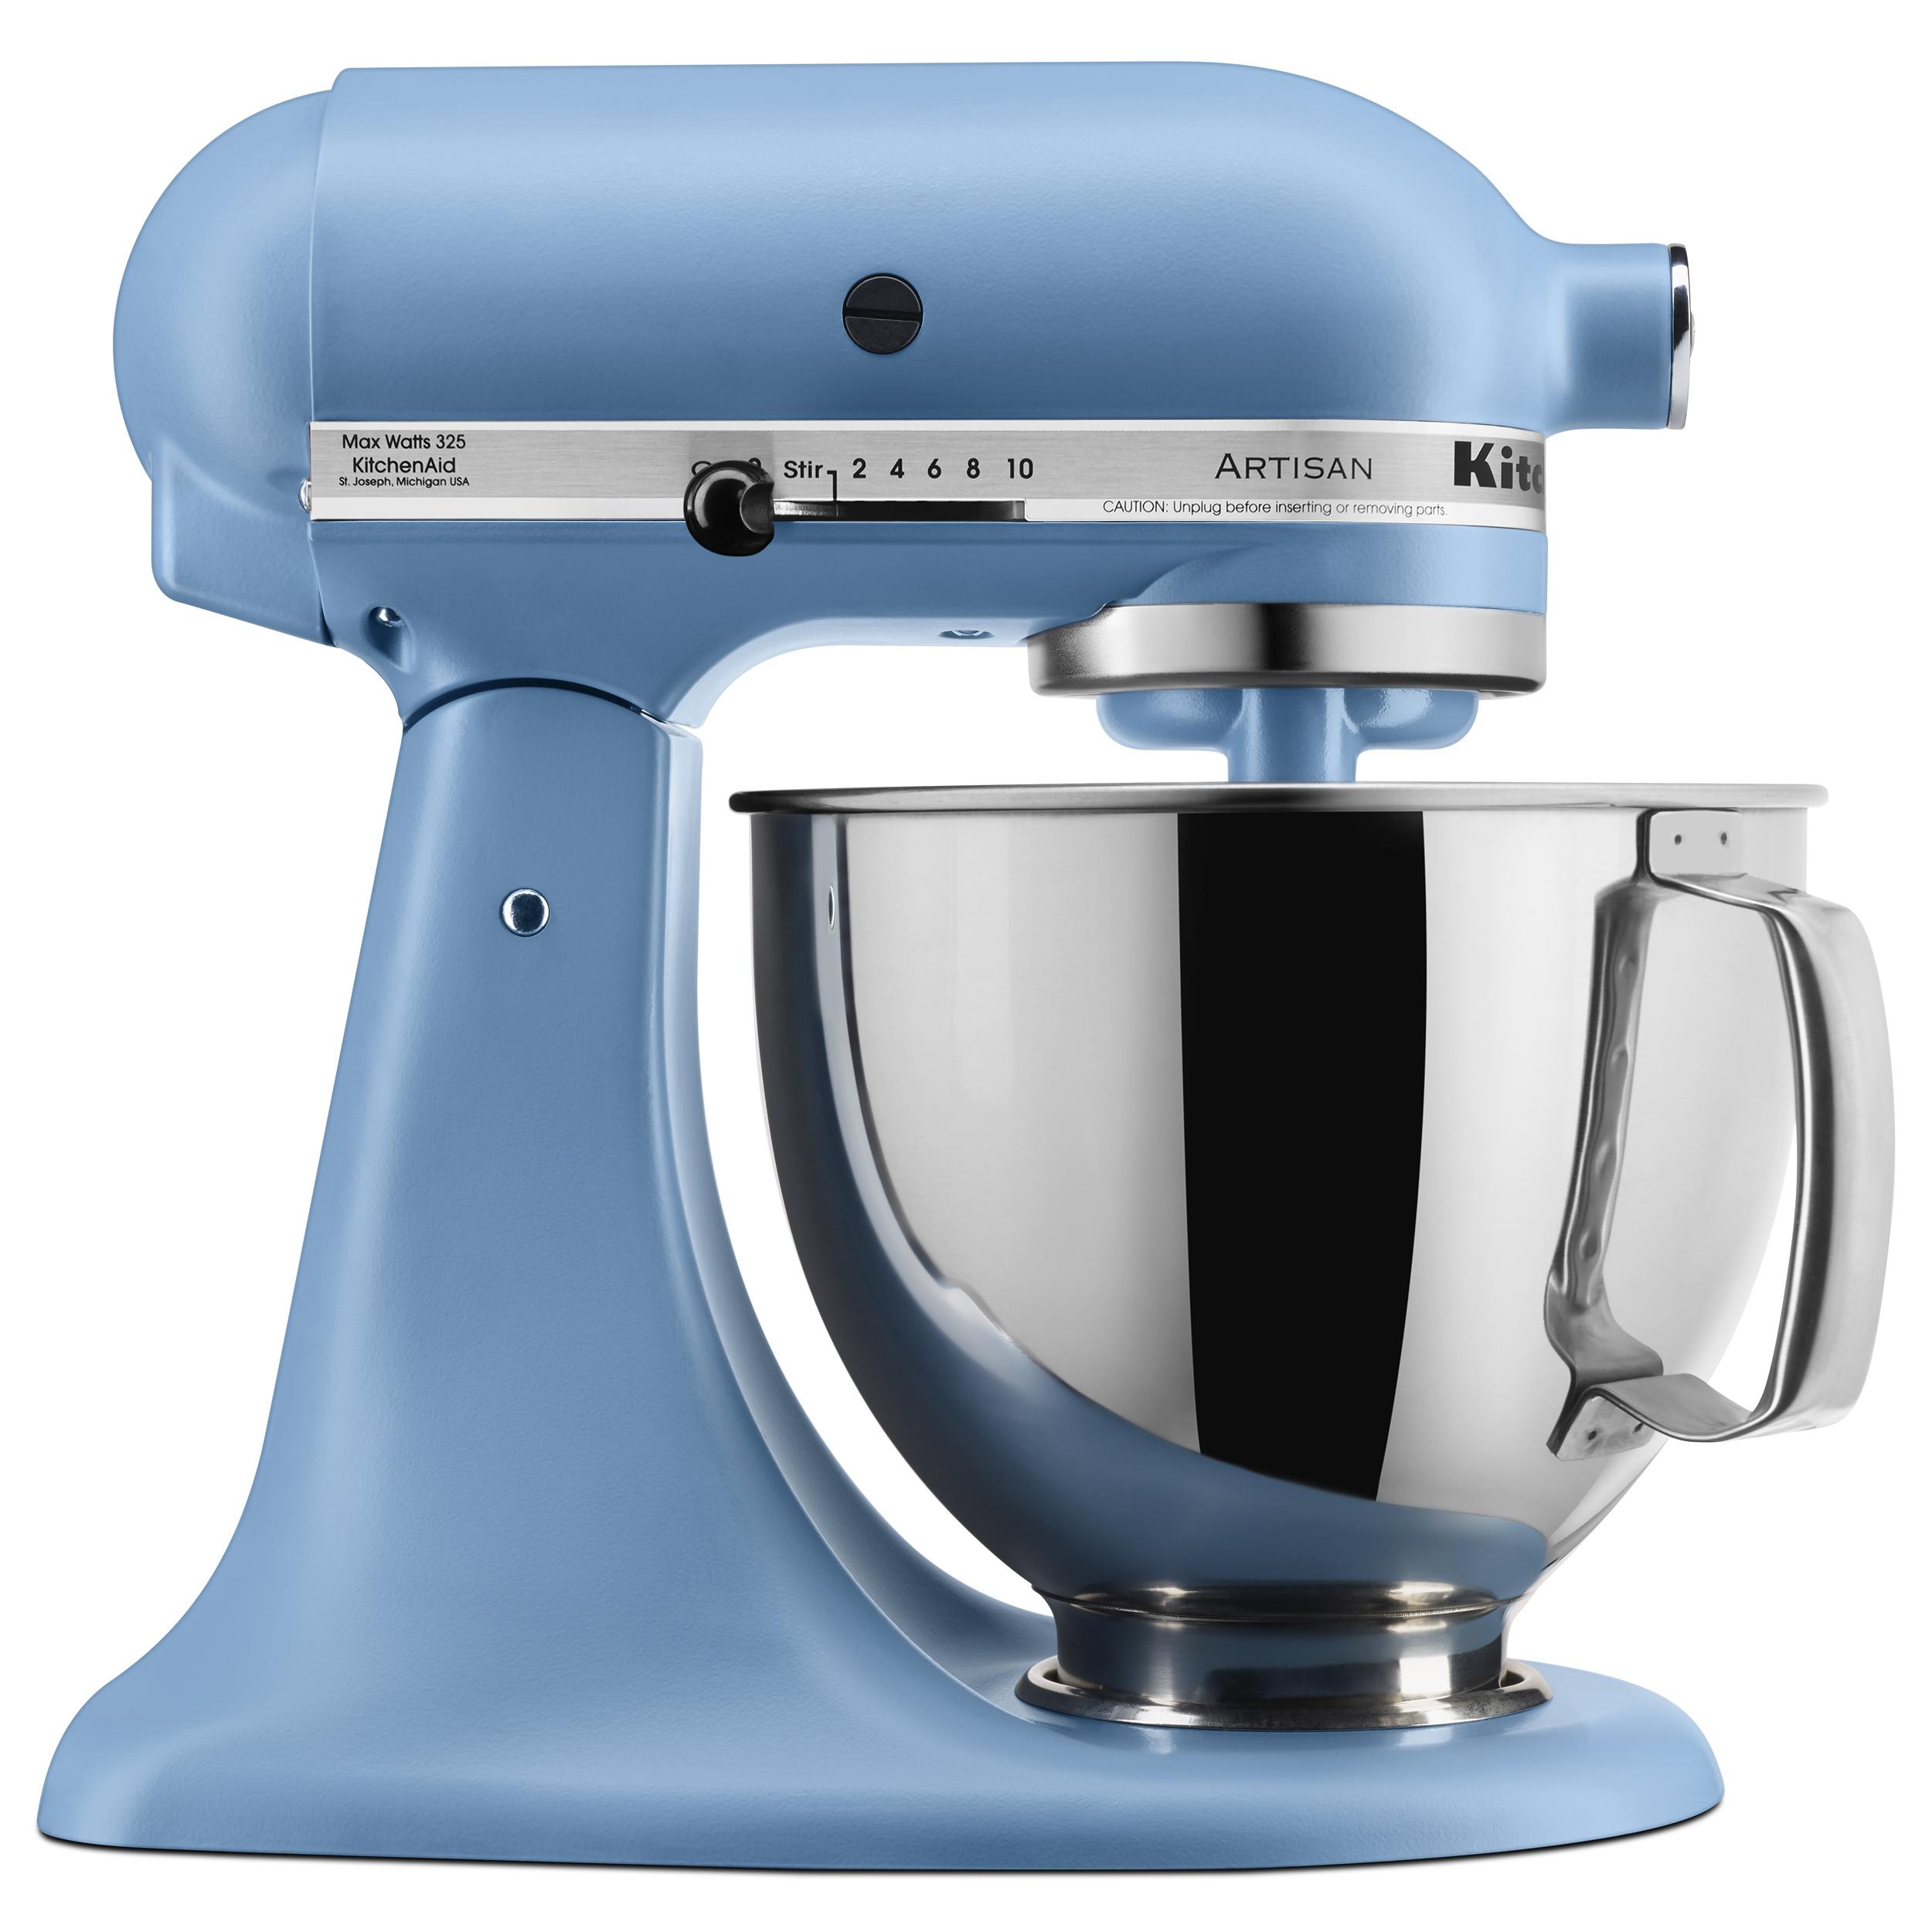 KitchenAid KSM150 Artisan Stand Mixer, 5 quart, Matte Velvet Blue, Walmart B&M Clearance YMMV $149